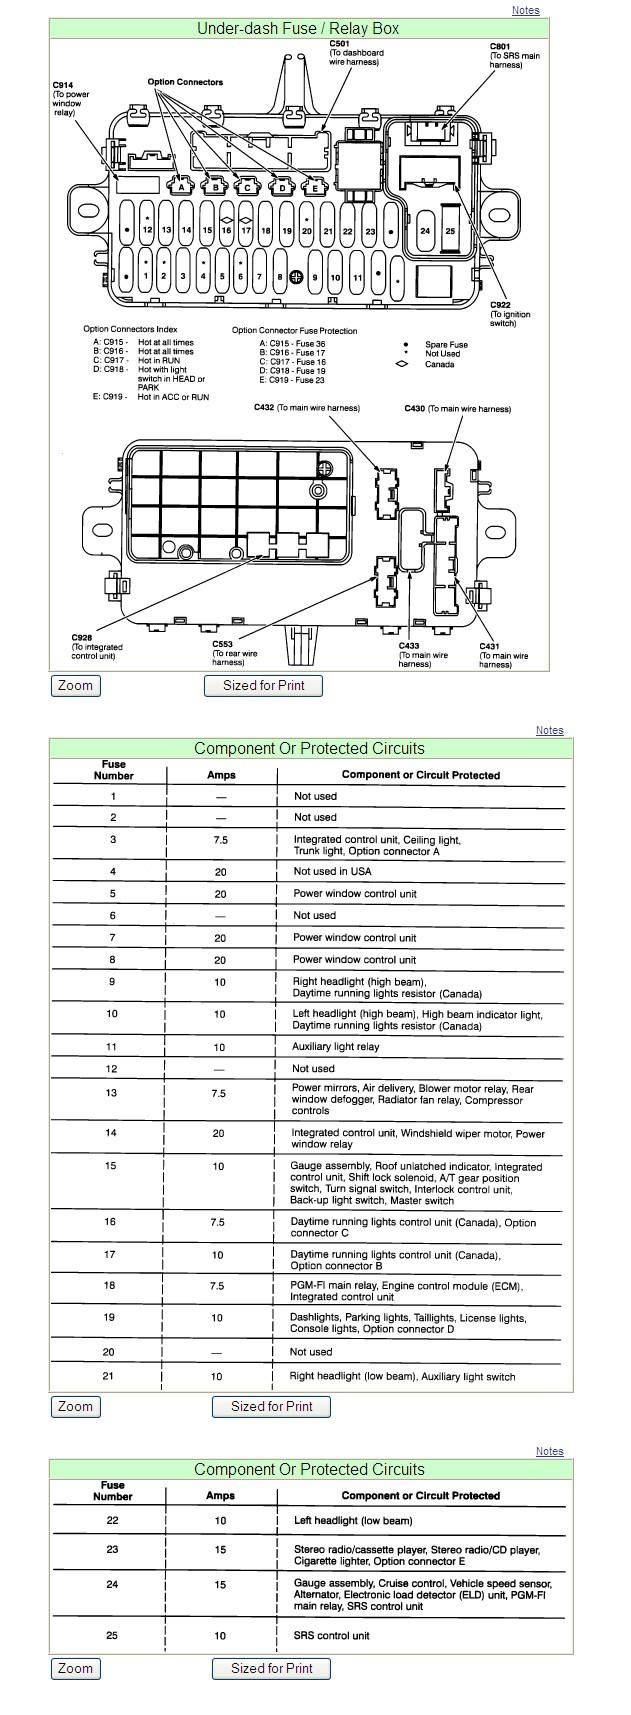 93 Del Sol Electrical Wiring Diagram - 94 Cadillac Wiring Diagram -  delco-electronics.yenpancane.jeanjaures37.fr | 93 Del Sol Fuse Box Diagram |  | Wiring Diagram Resource